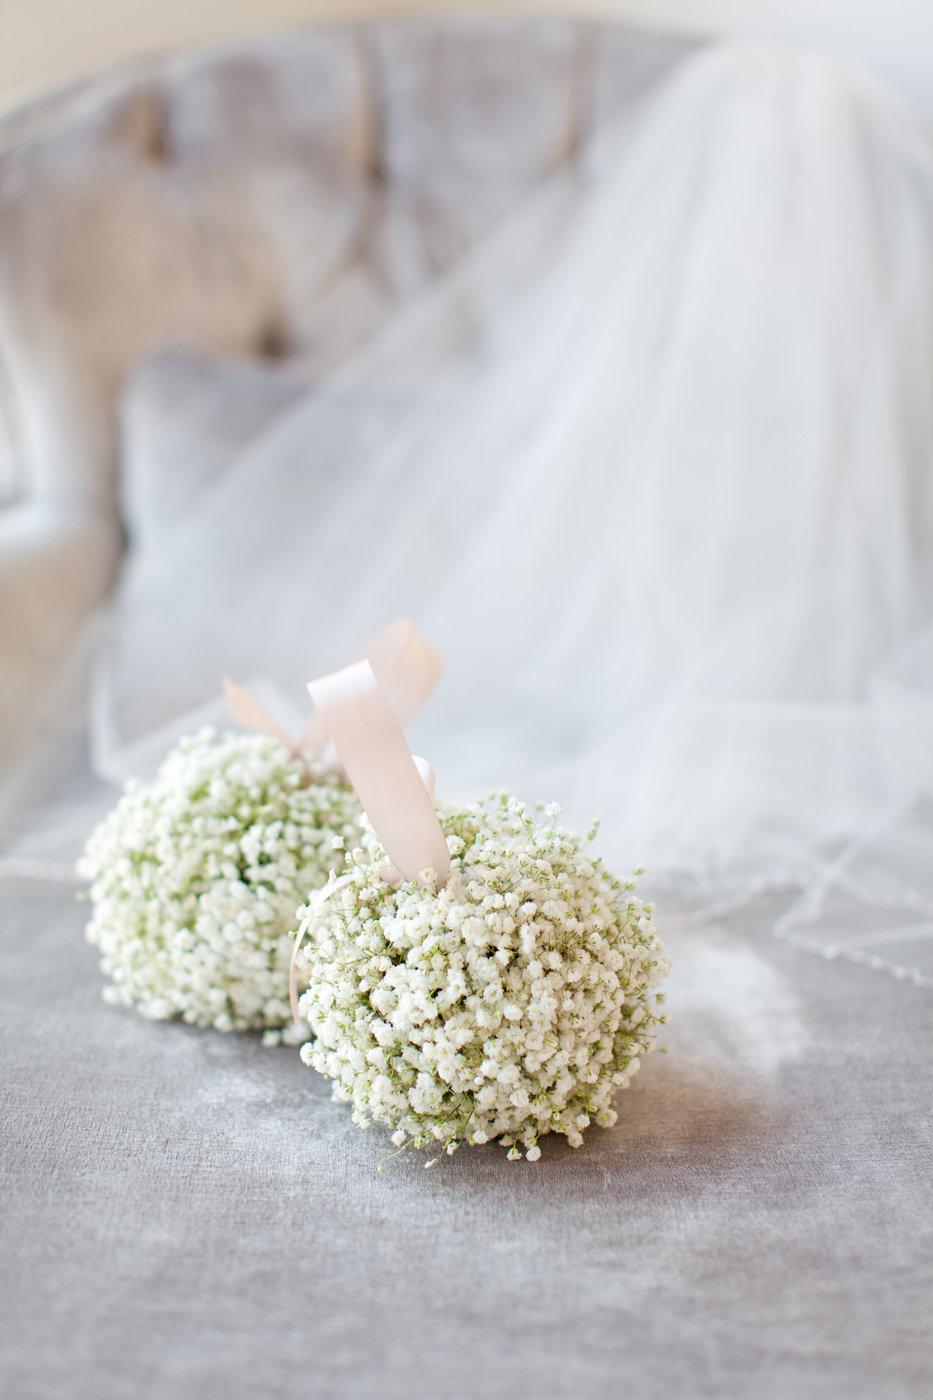 pomander wedding bouquet with baby's breath